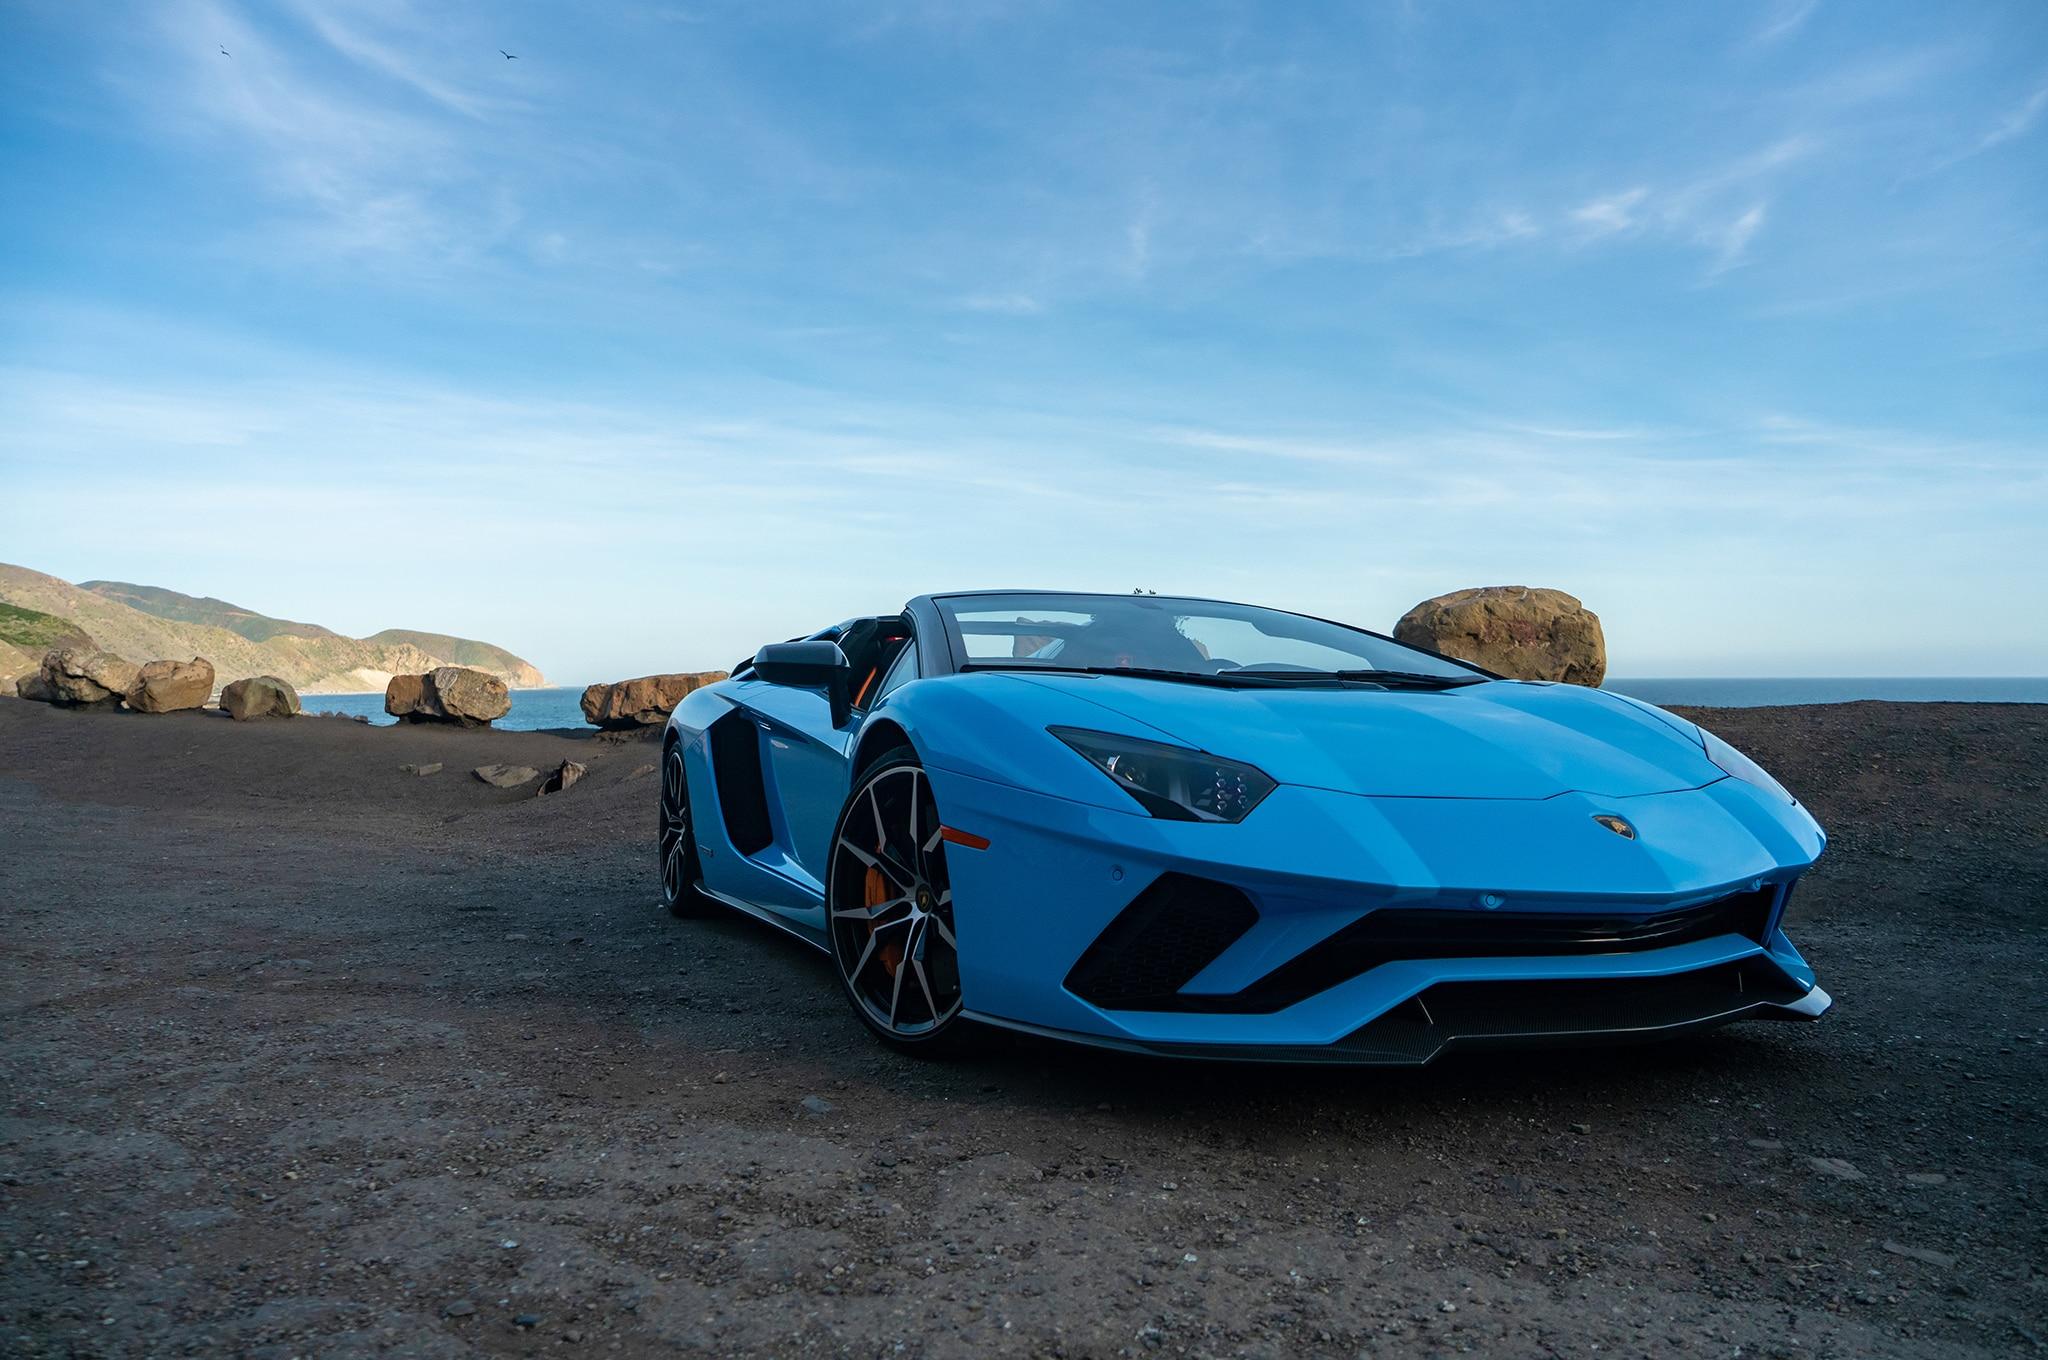 2018 Lamborghini Aventador S Roadster Front Three Quarter 07